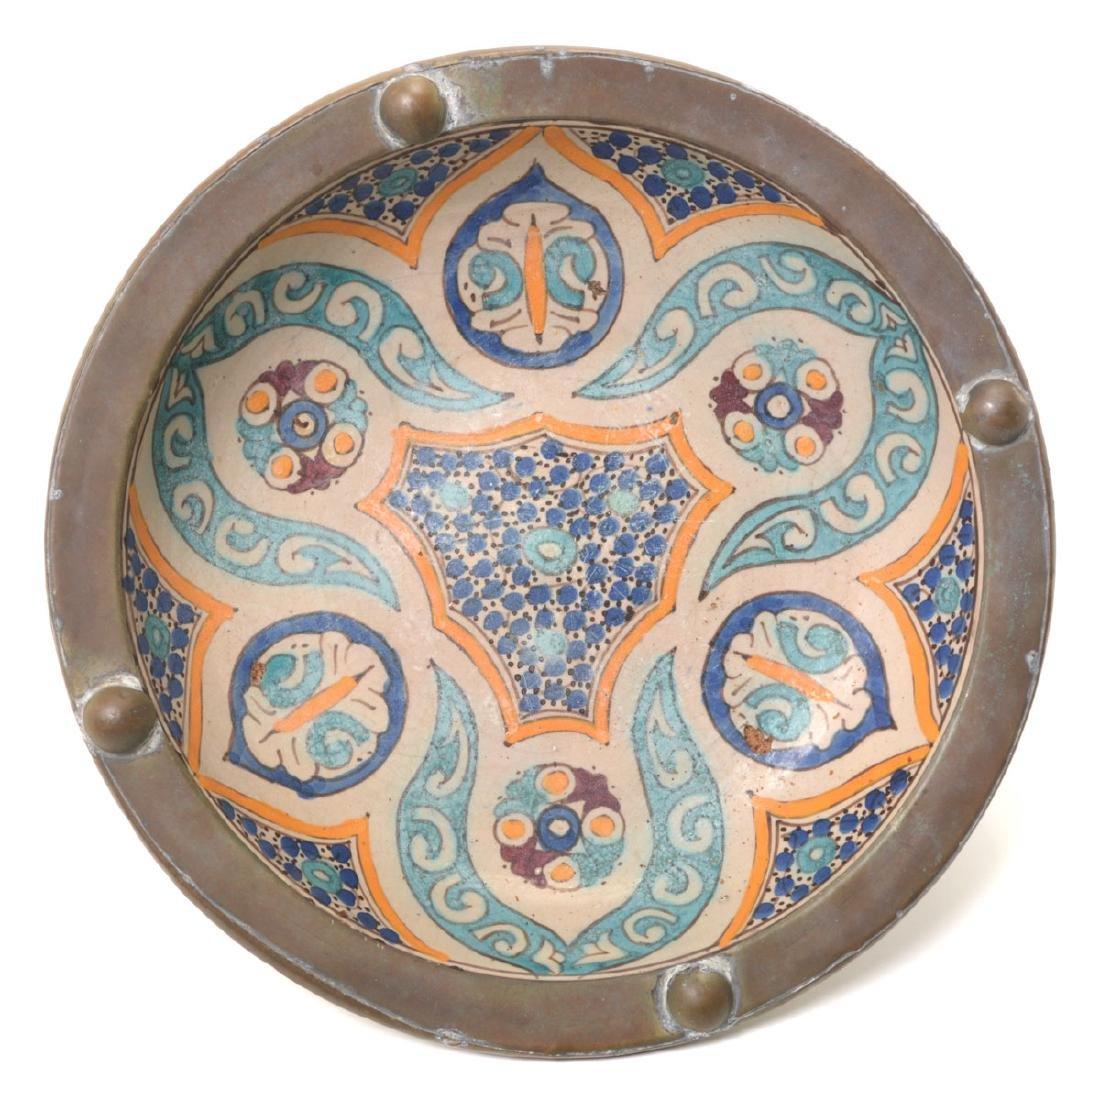 Copper Mounted Talavera Faience Bowl